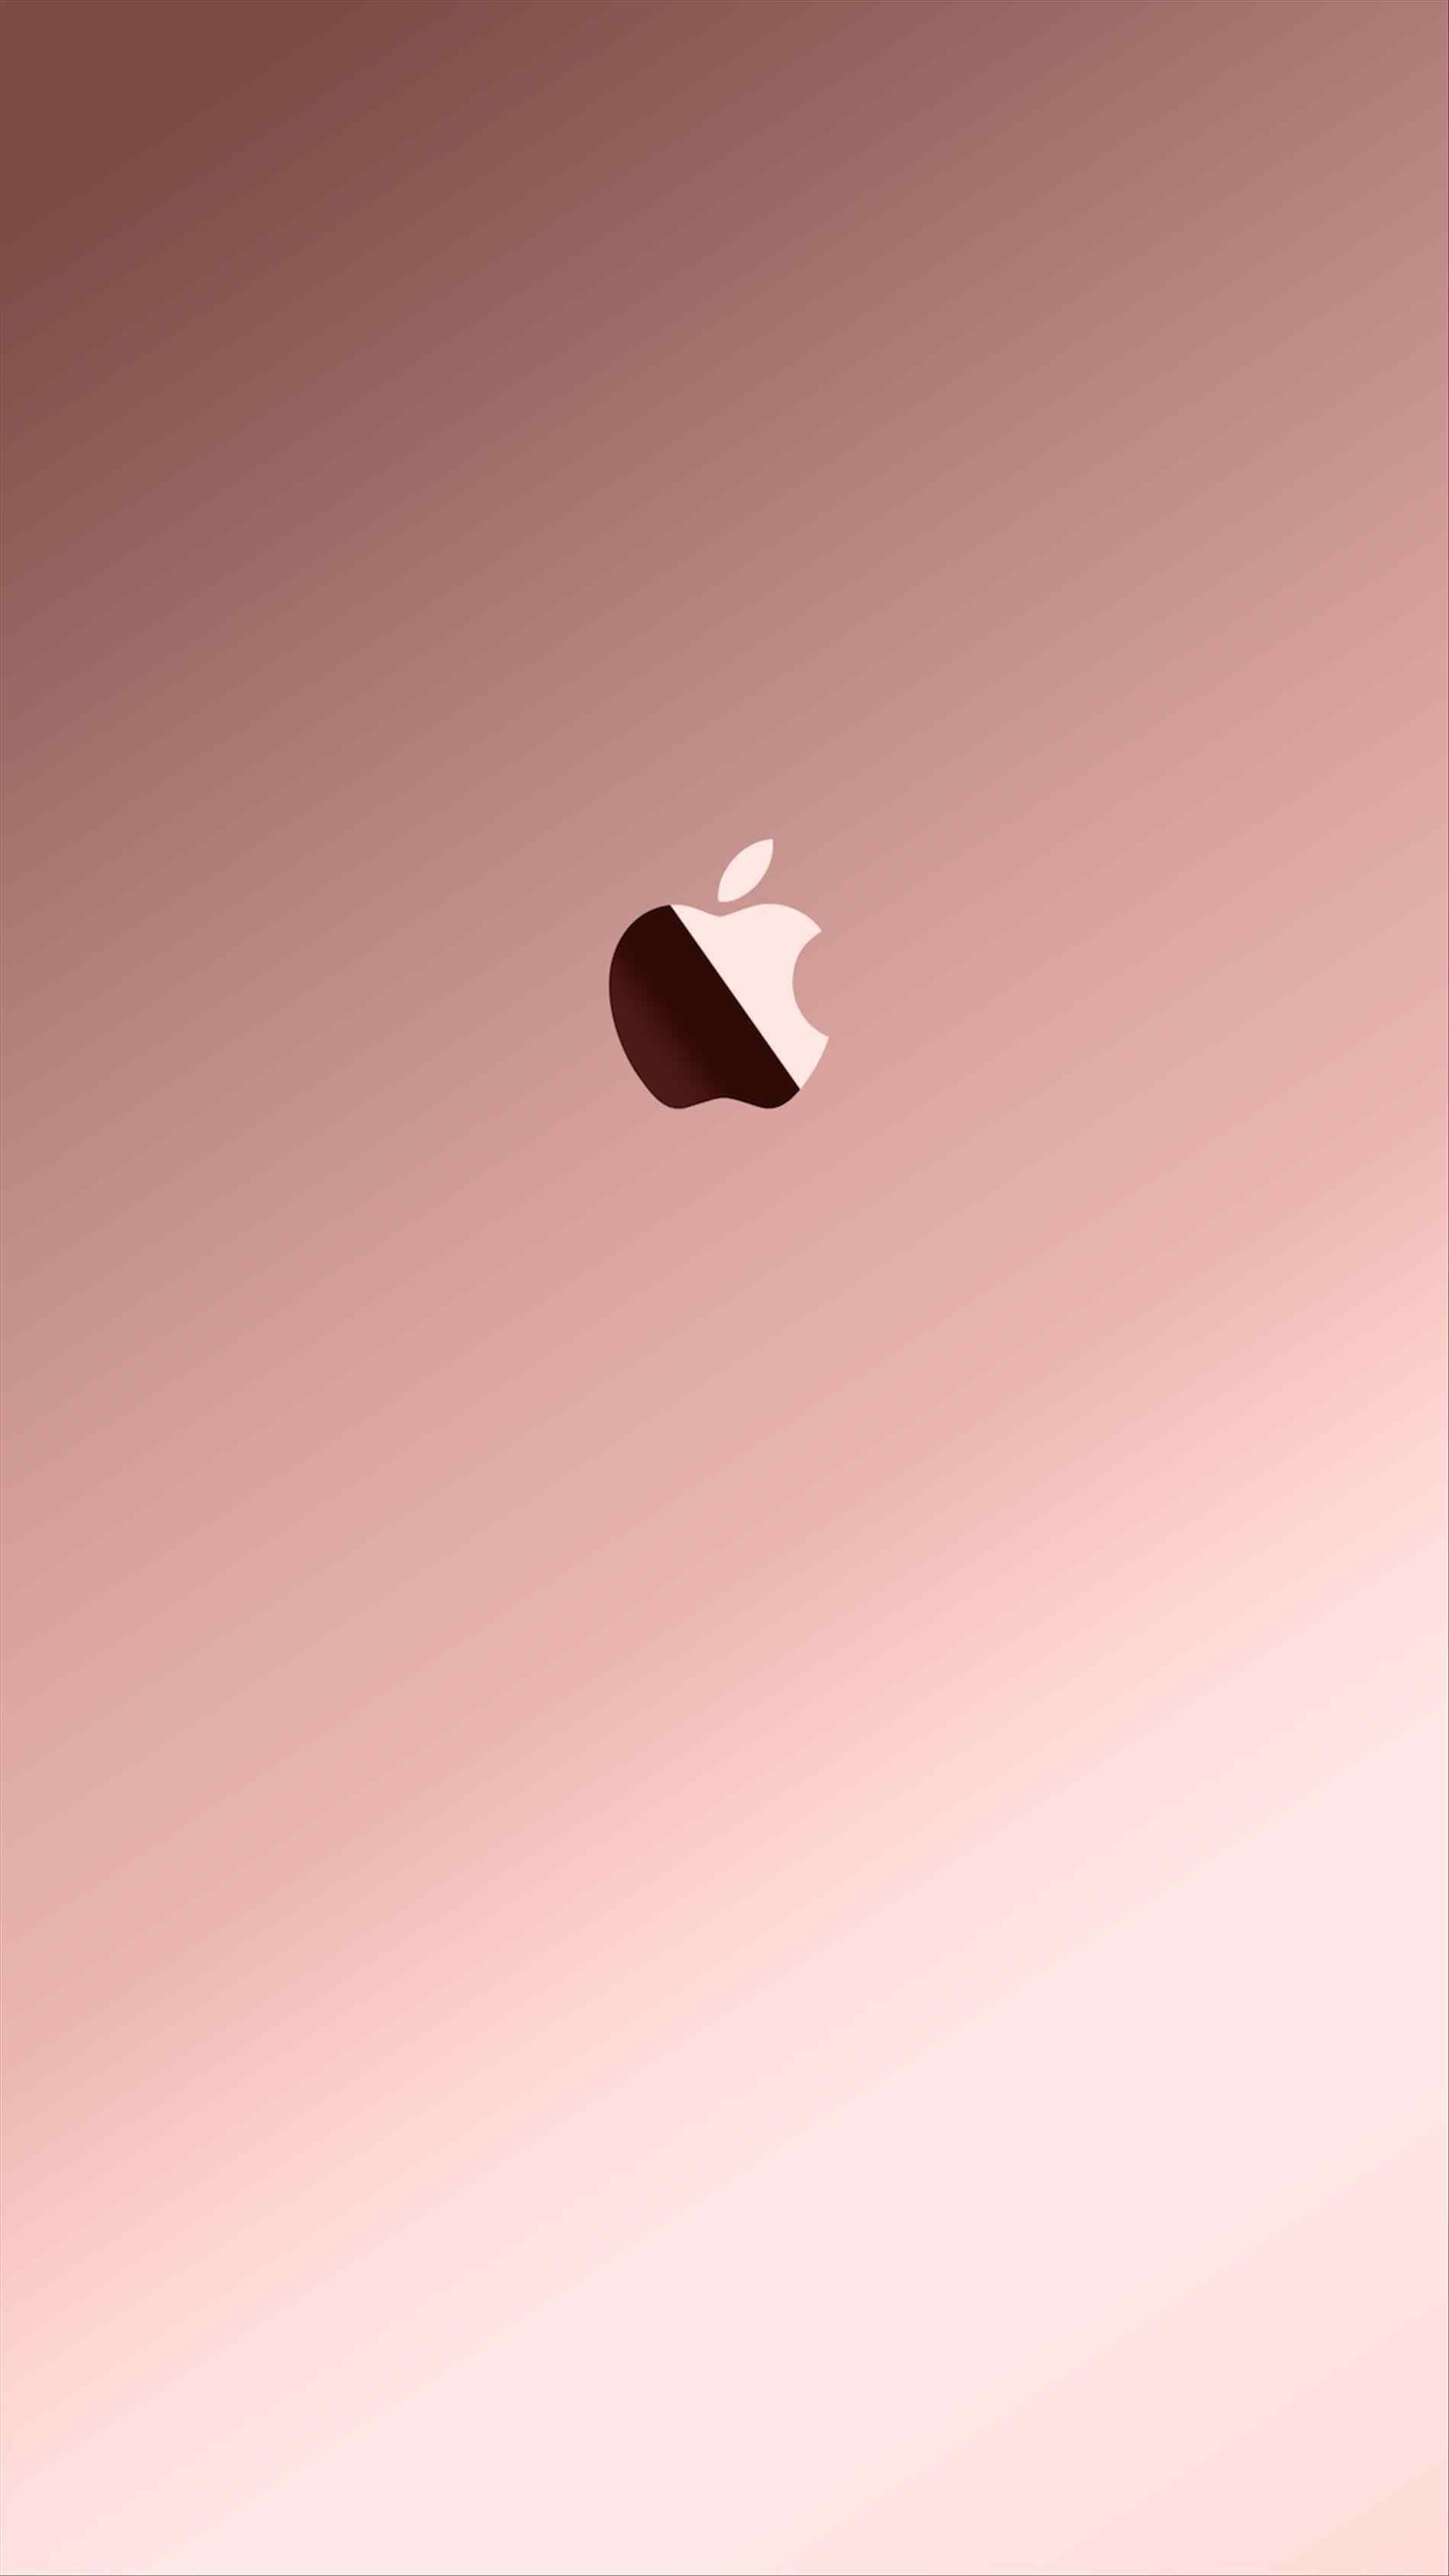 Pink Apple Logo Rose Gold 334135 Hd Wallpaper Backgrounds